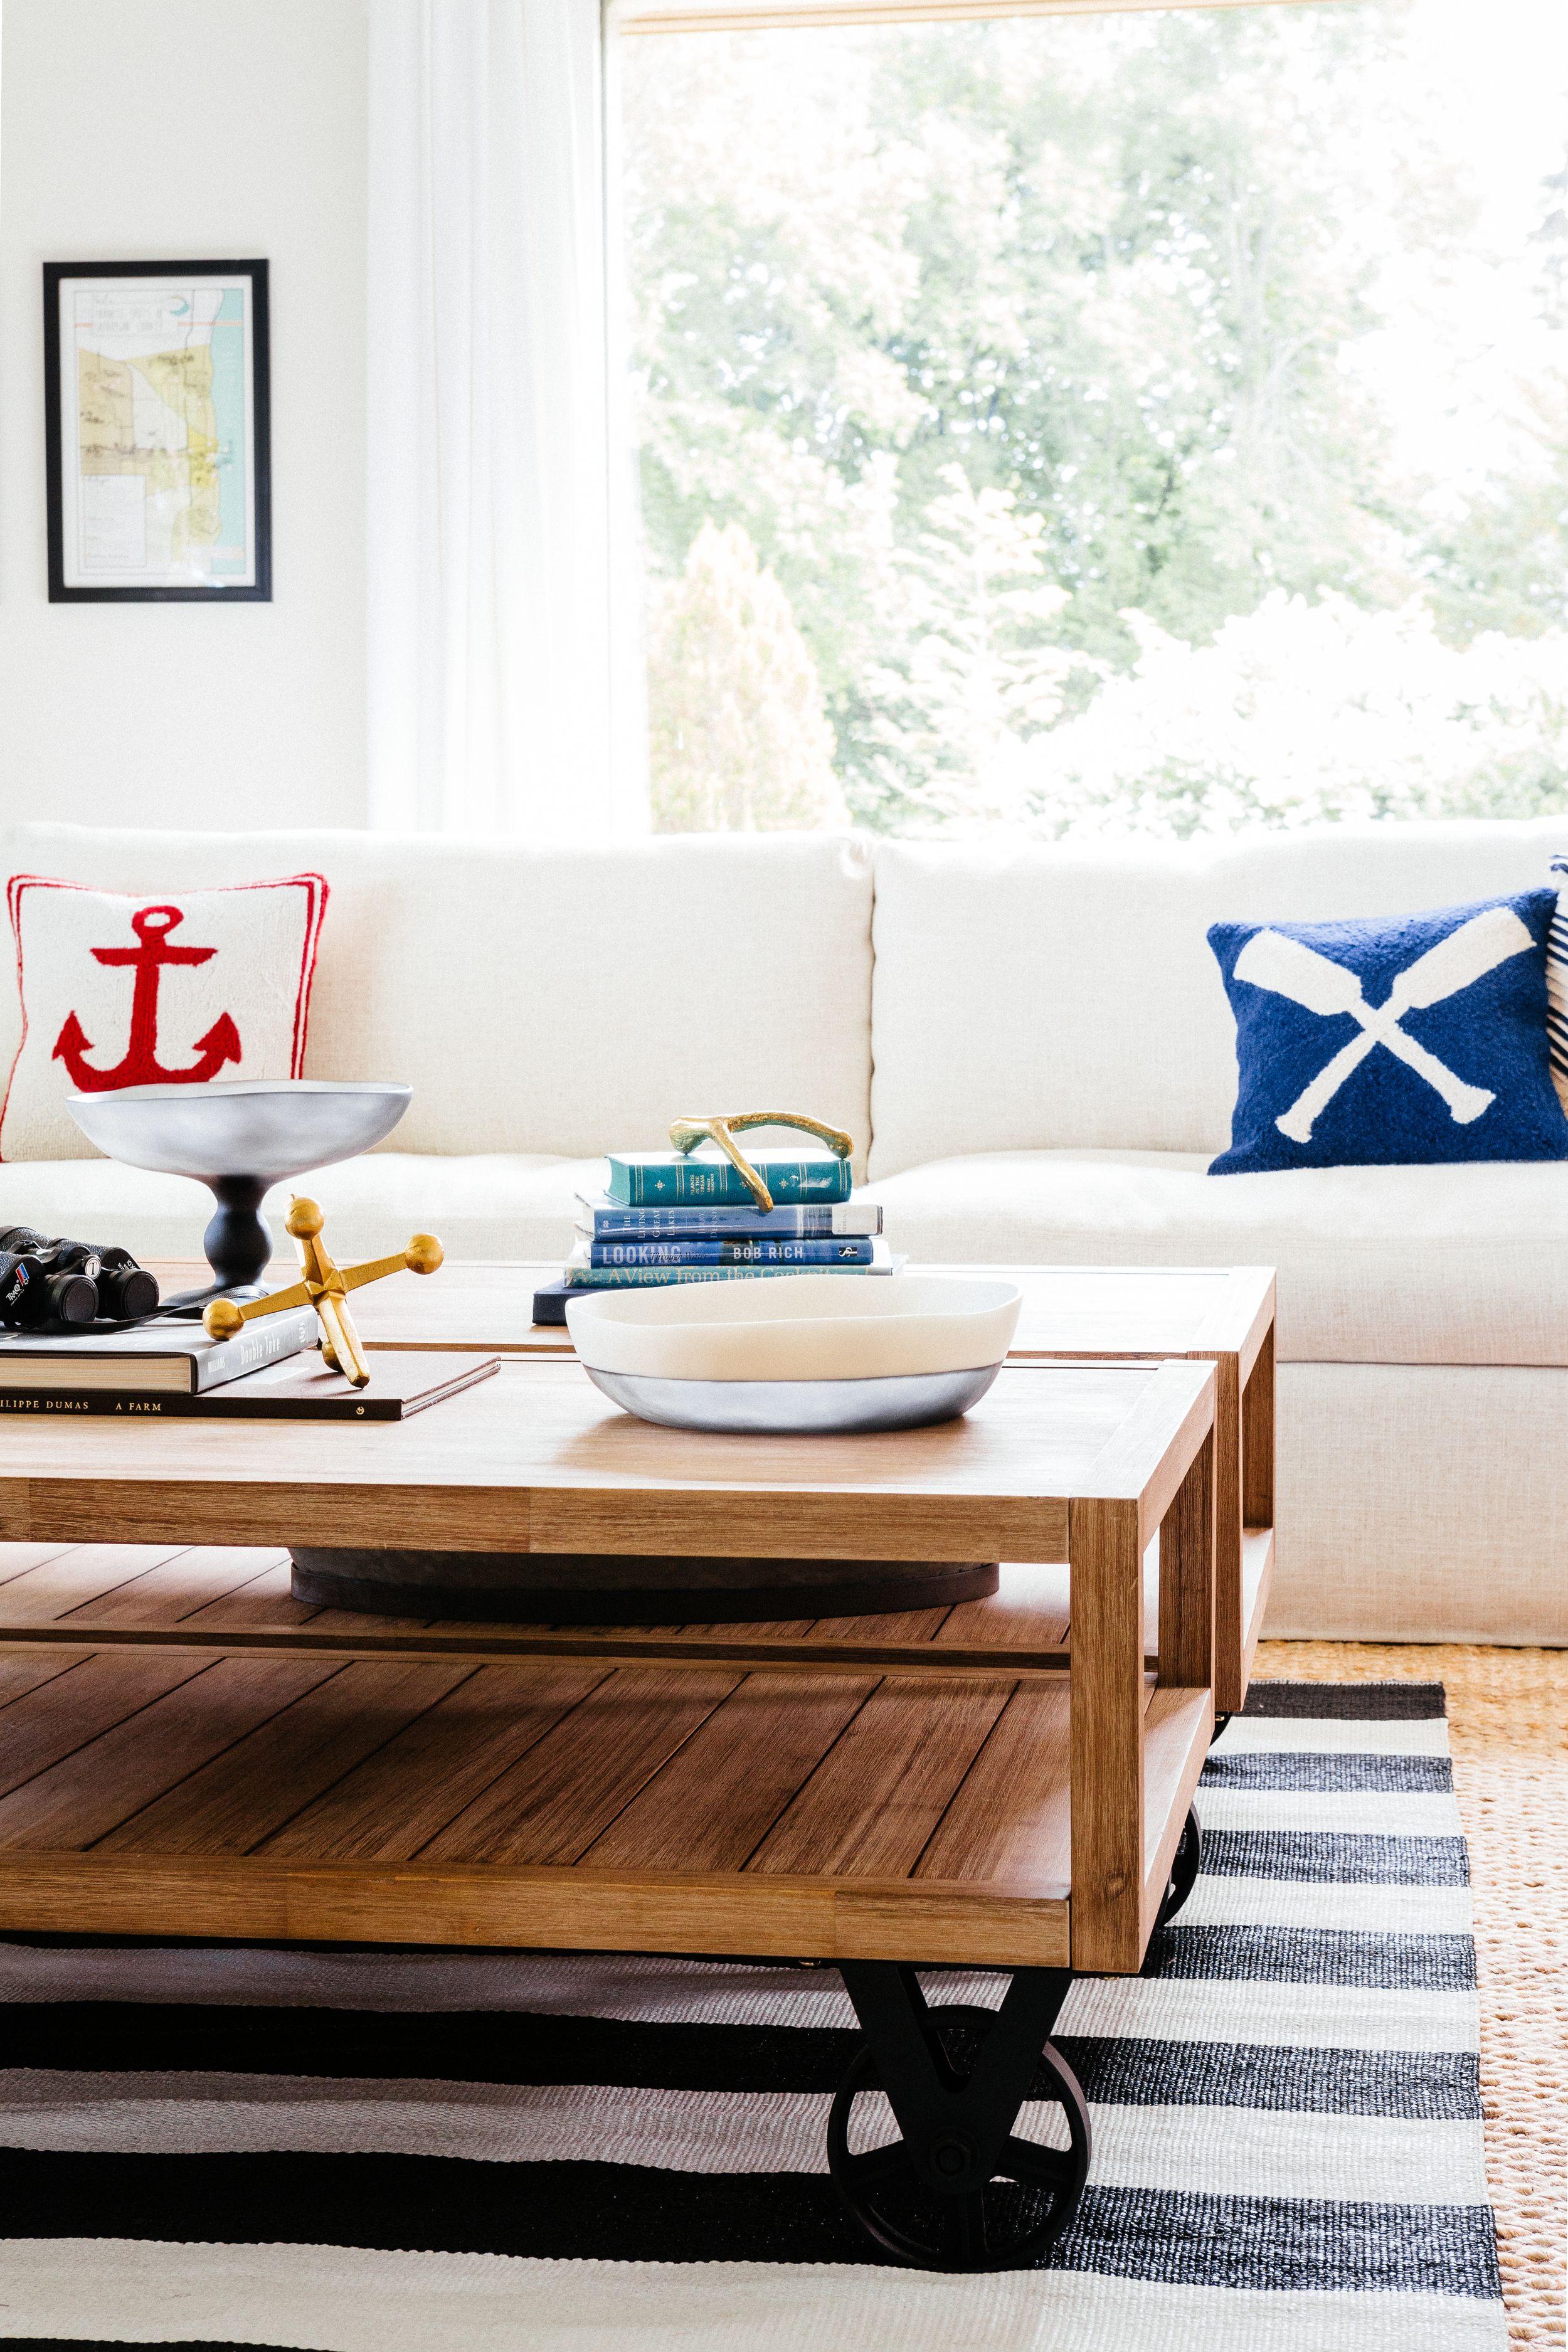 Interior Design by Noz Nozawa Noz Design The living